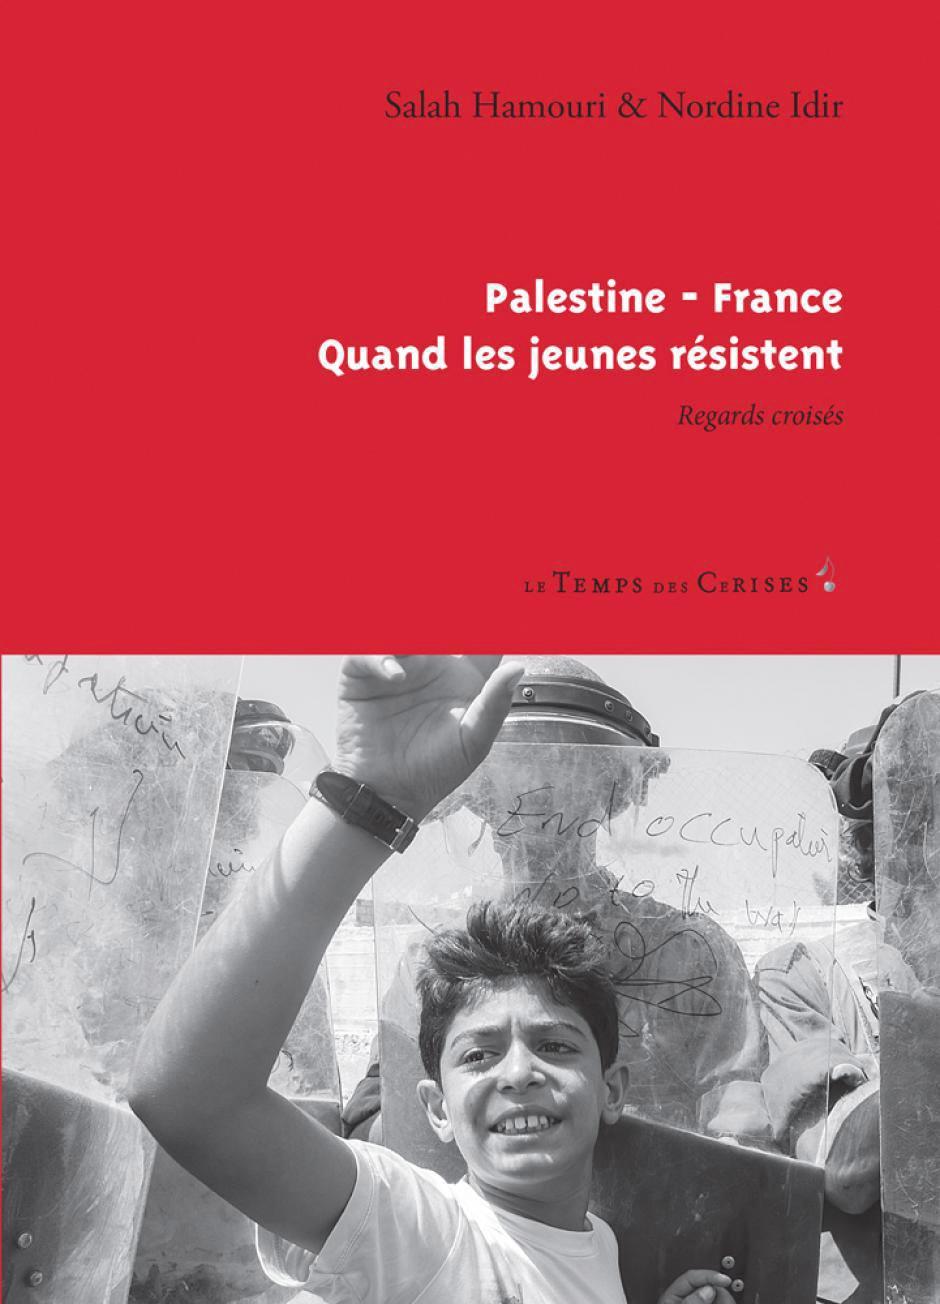 Palestine-France. Quand les jeunes résistent, Salah Hamouri, Nordine Idir